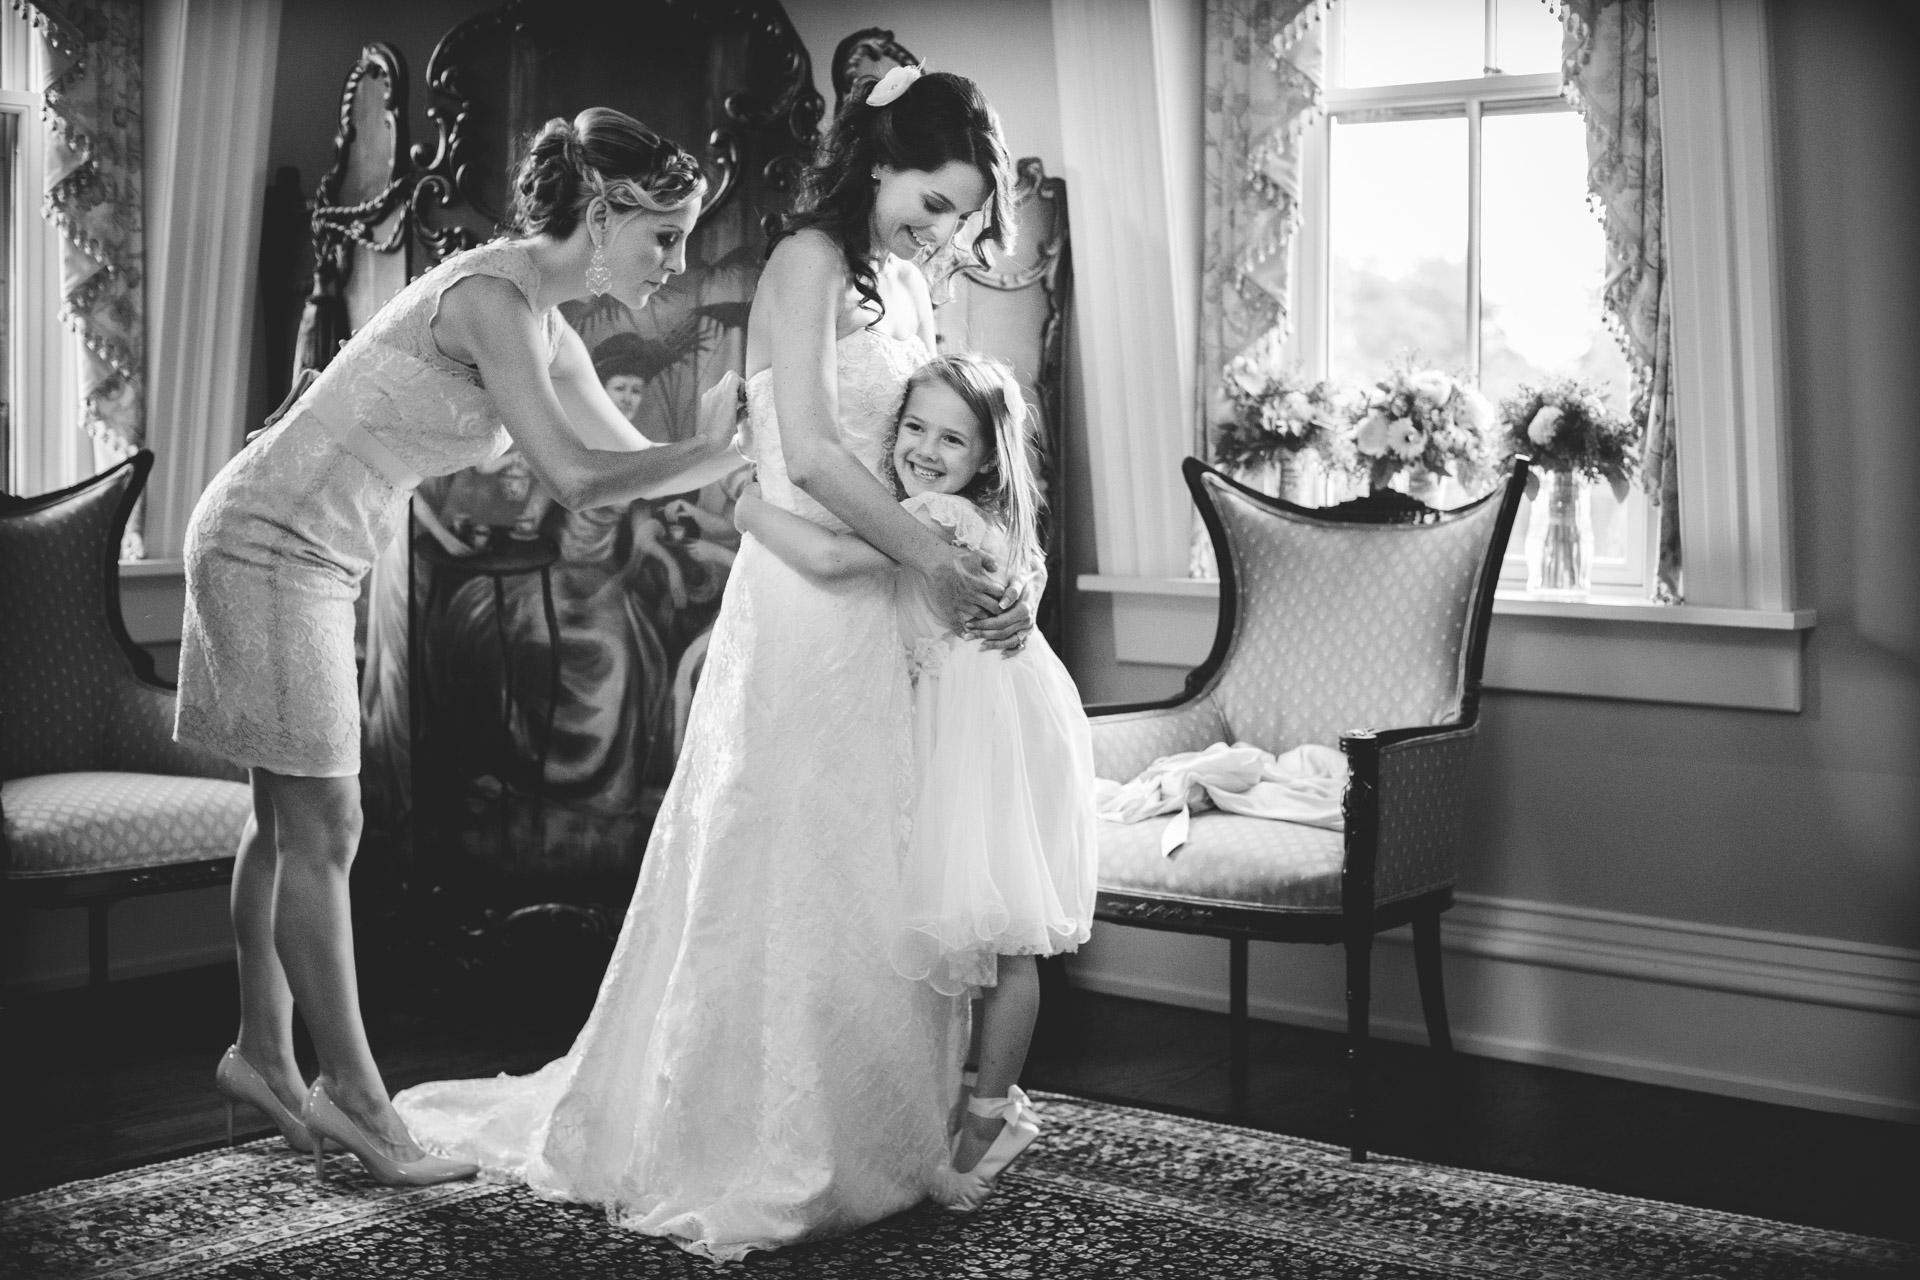 Wedding Photos at Webb Barn Wethersfield -10.jpg